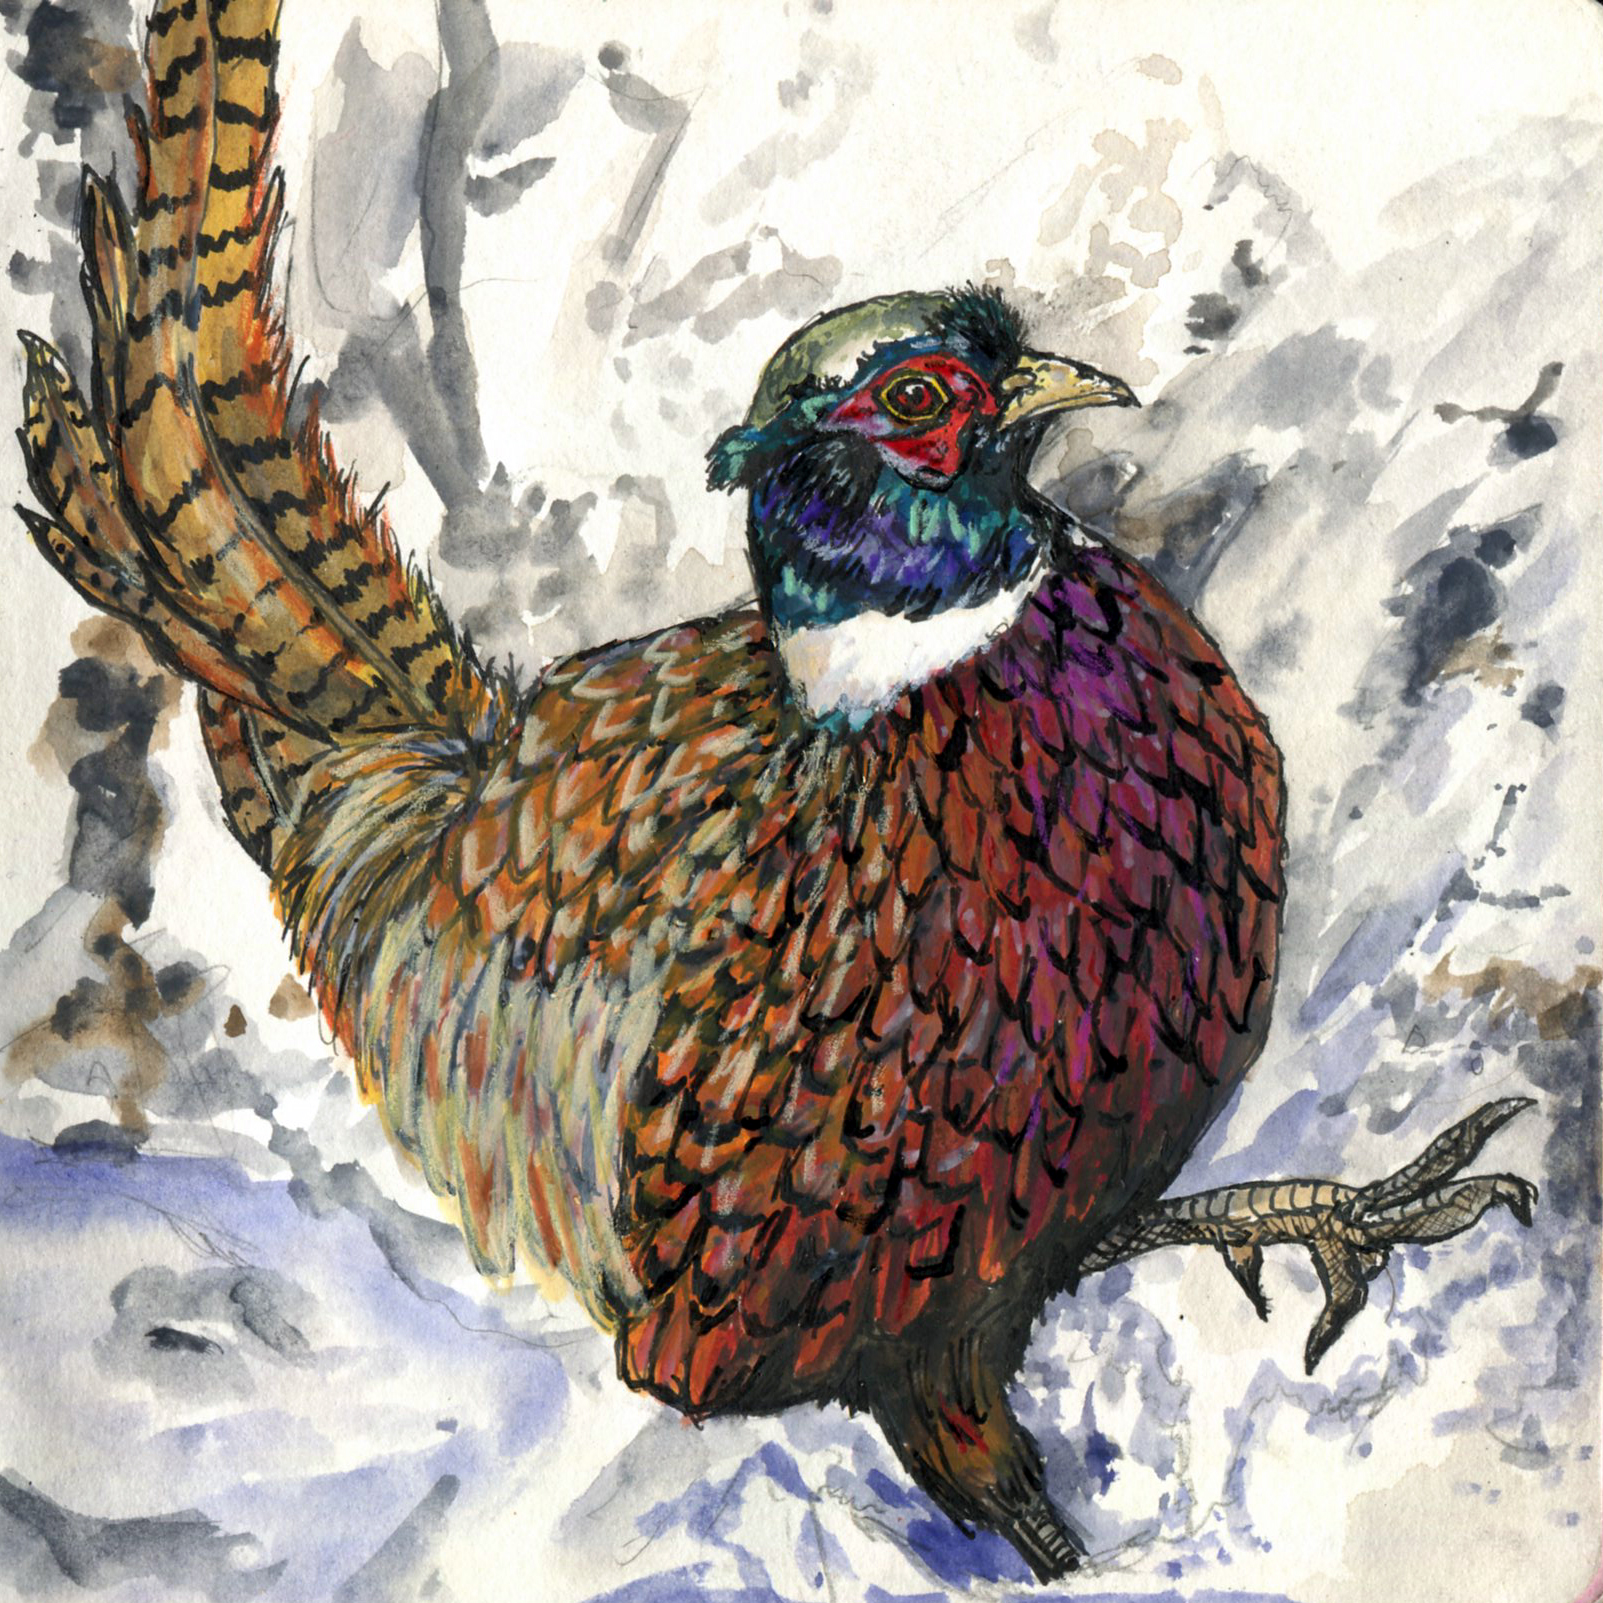 75. Ring-necked Pheasant